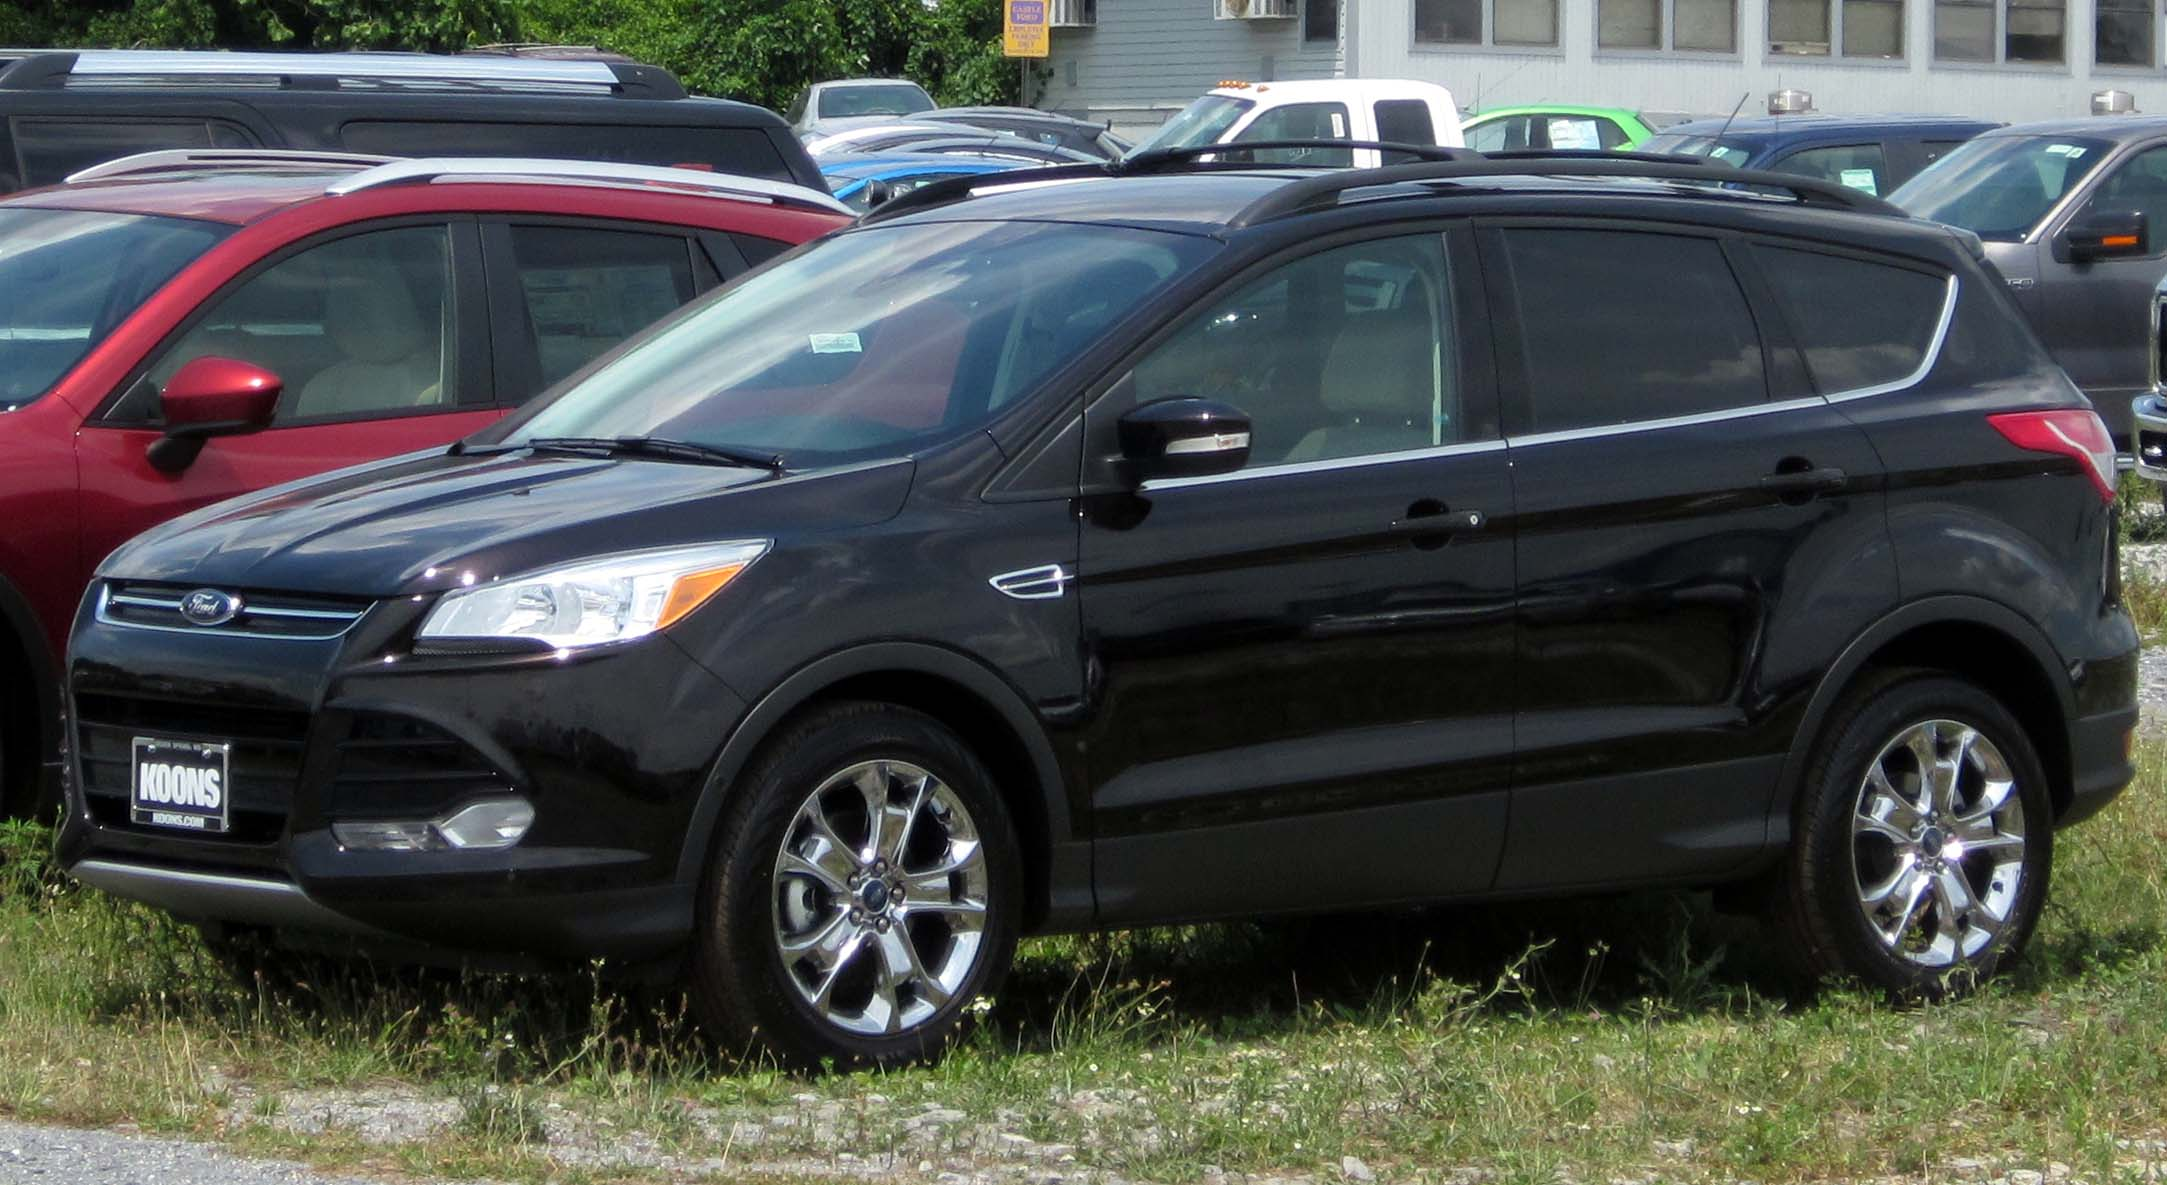 Kuga Dimensions >> File:2013 Ford Escape -- 07-11-2012.JPG - Wikimedia Commons